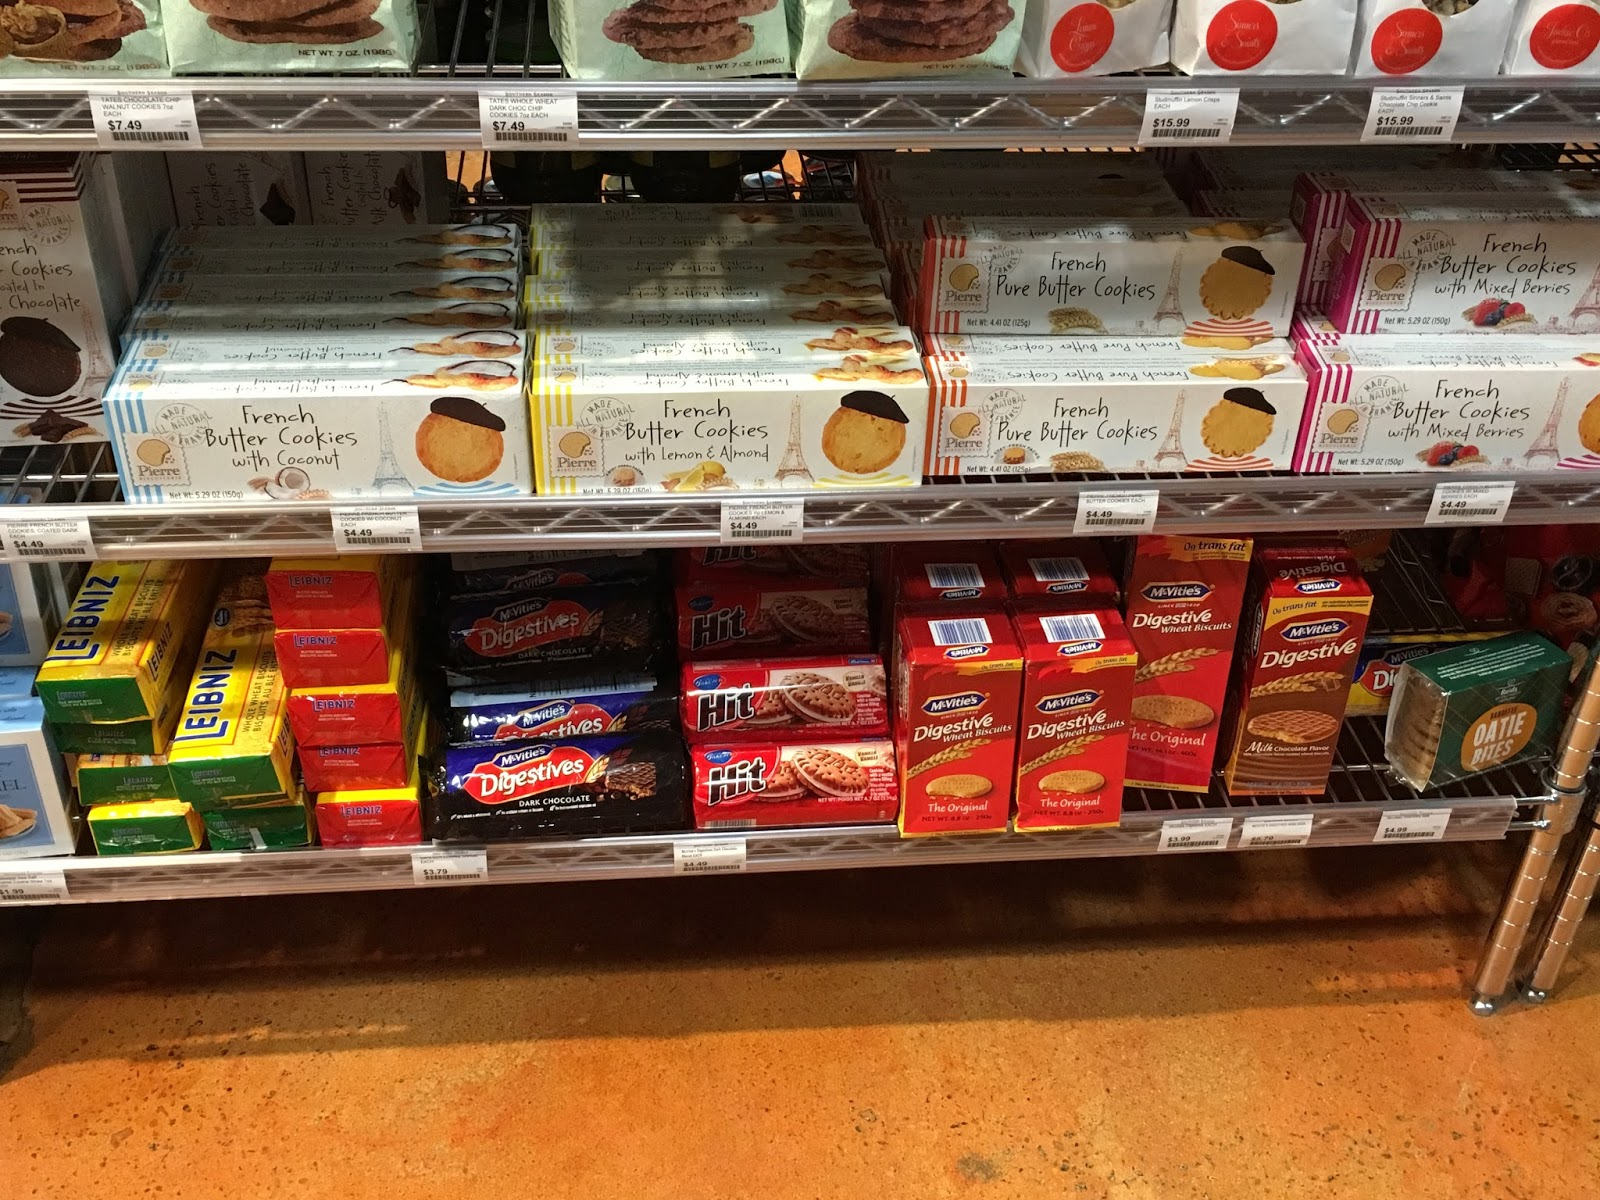 Jaffa Cakes Usa Supplier